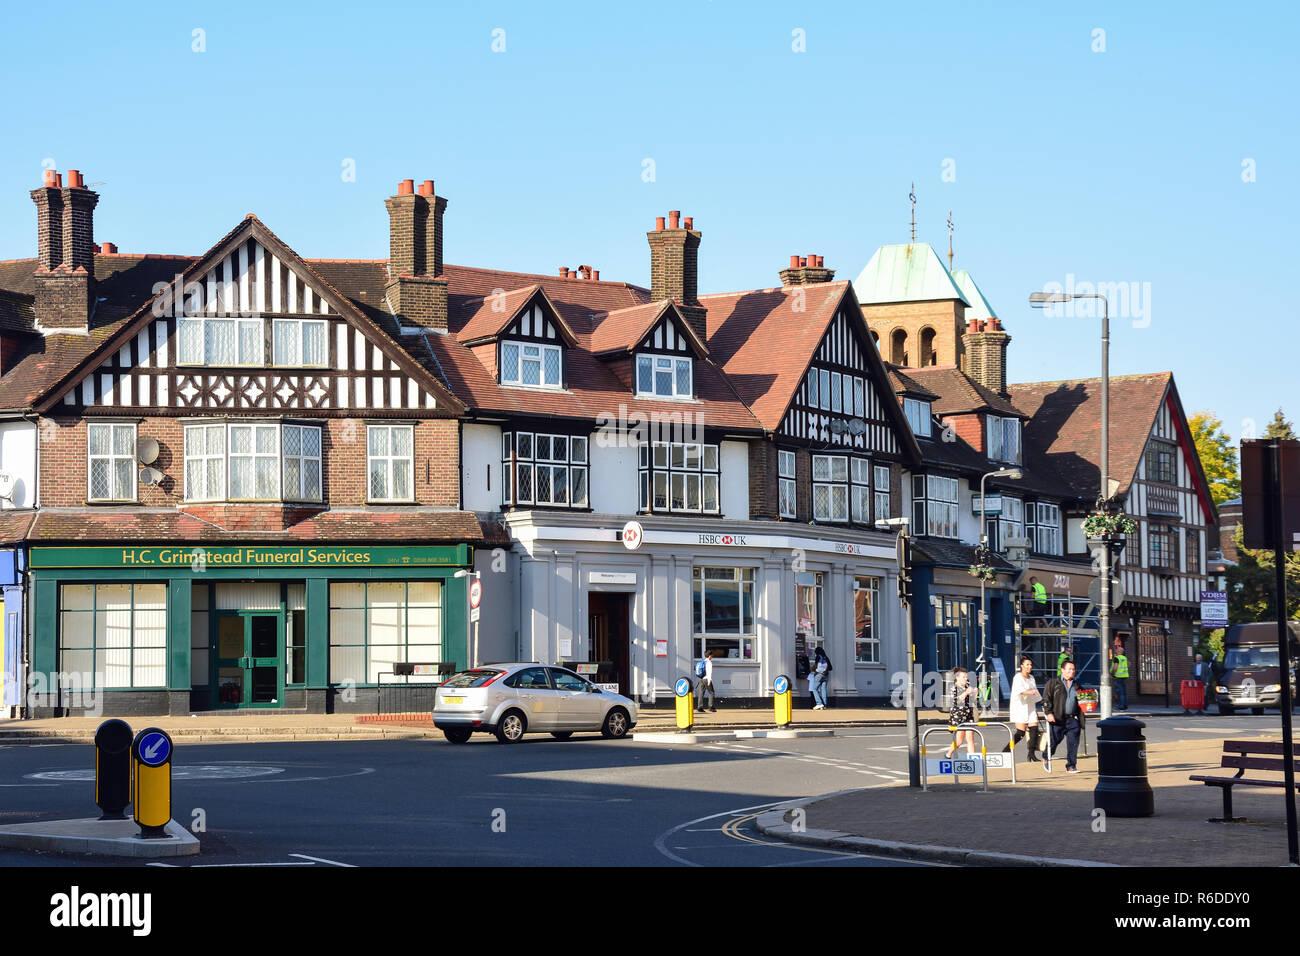 Love Lane, Pinner, London Borough of Harrow, Greater London, England, United Kingdom - Stock Image